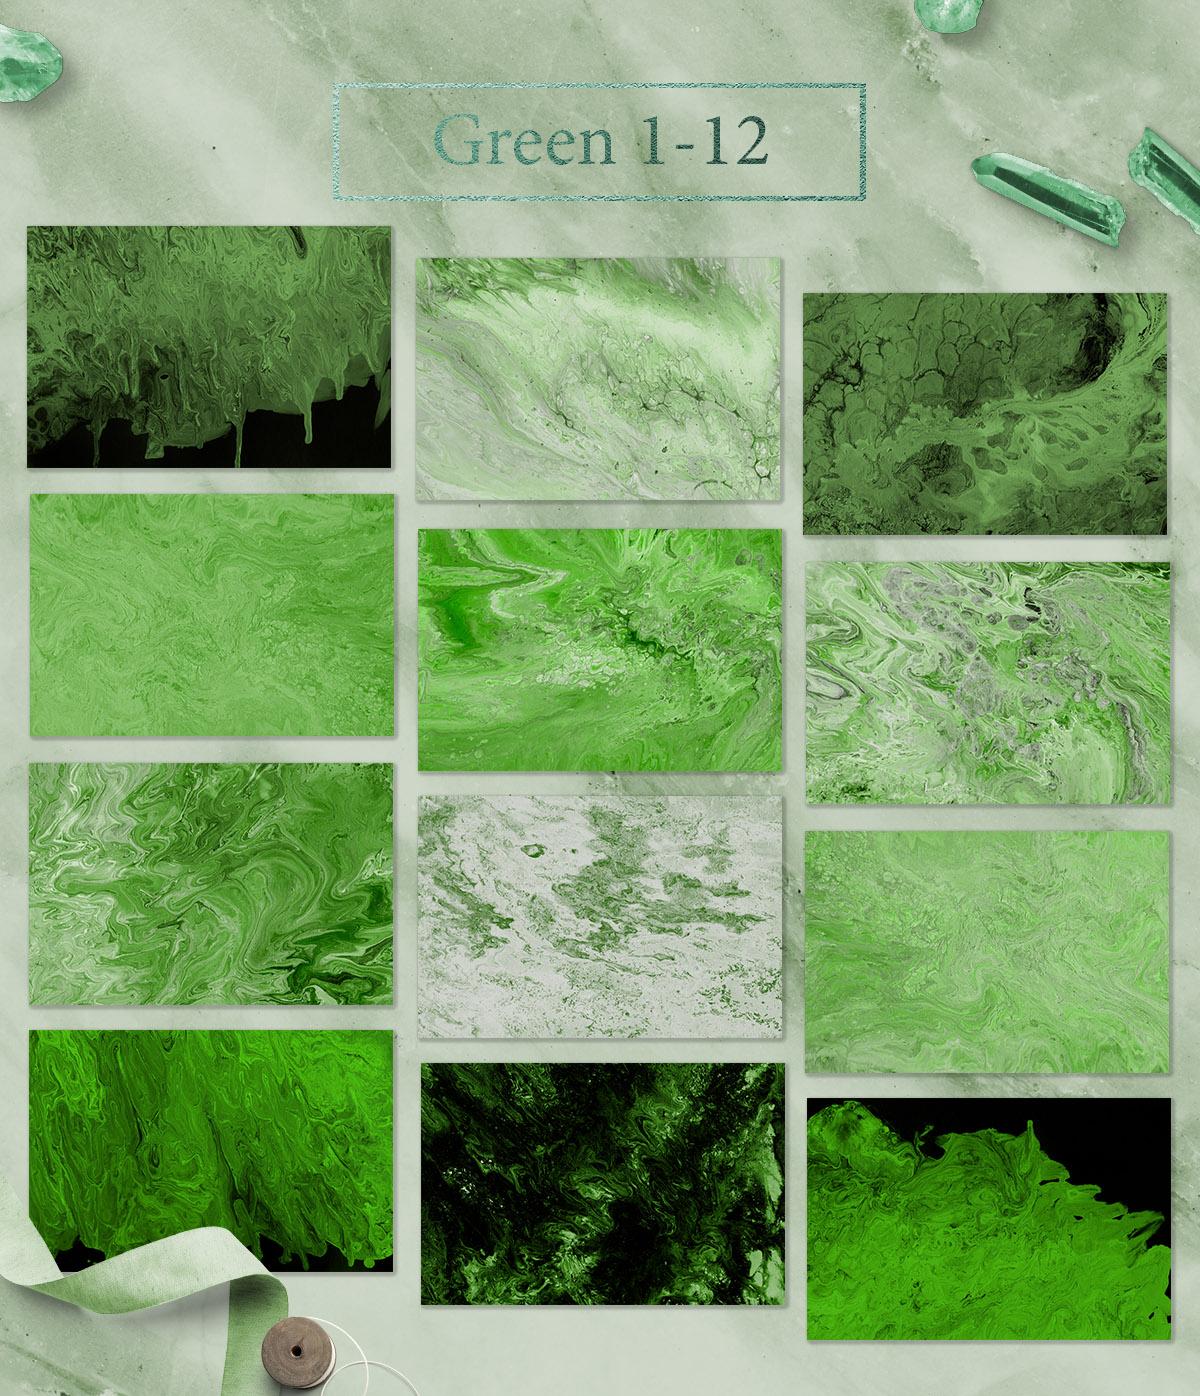 108 Flow Liquid Textures example image 6